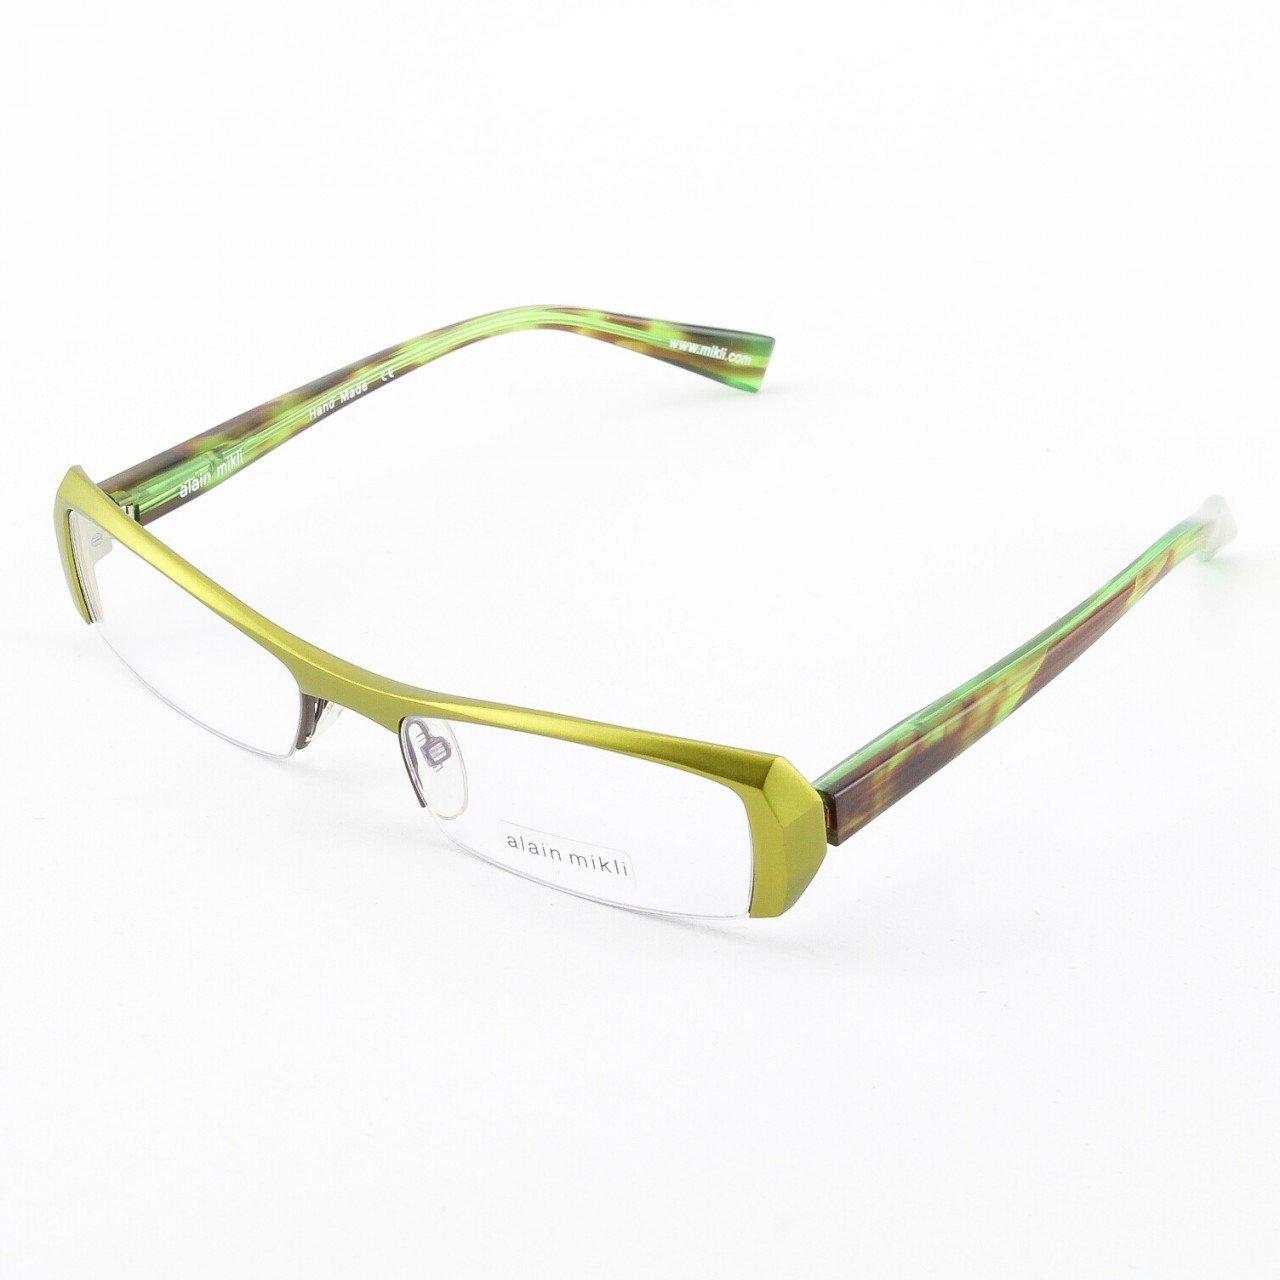 Alain Mikli Eyeglasses AL0613 Col. 16 Metallic Green Frame with Mottled Brown/Green Temples